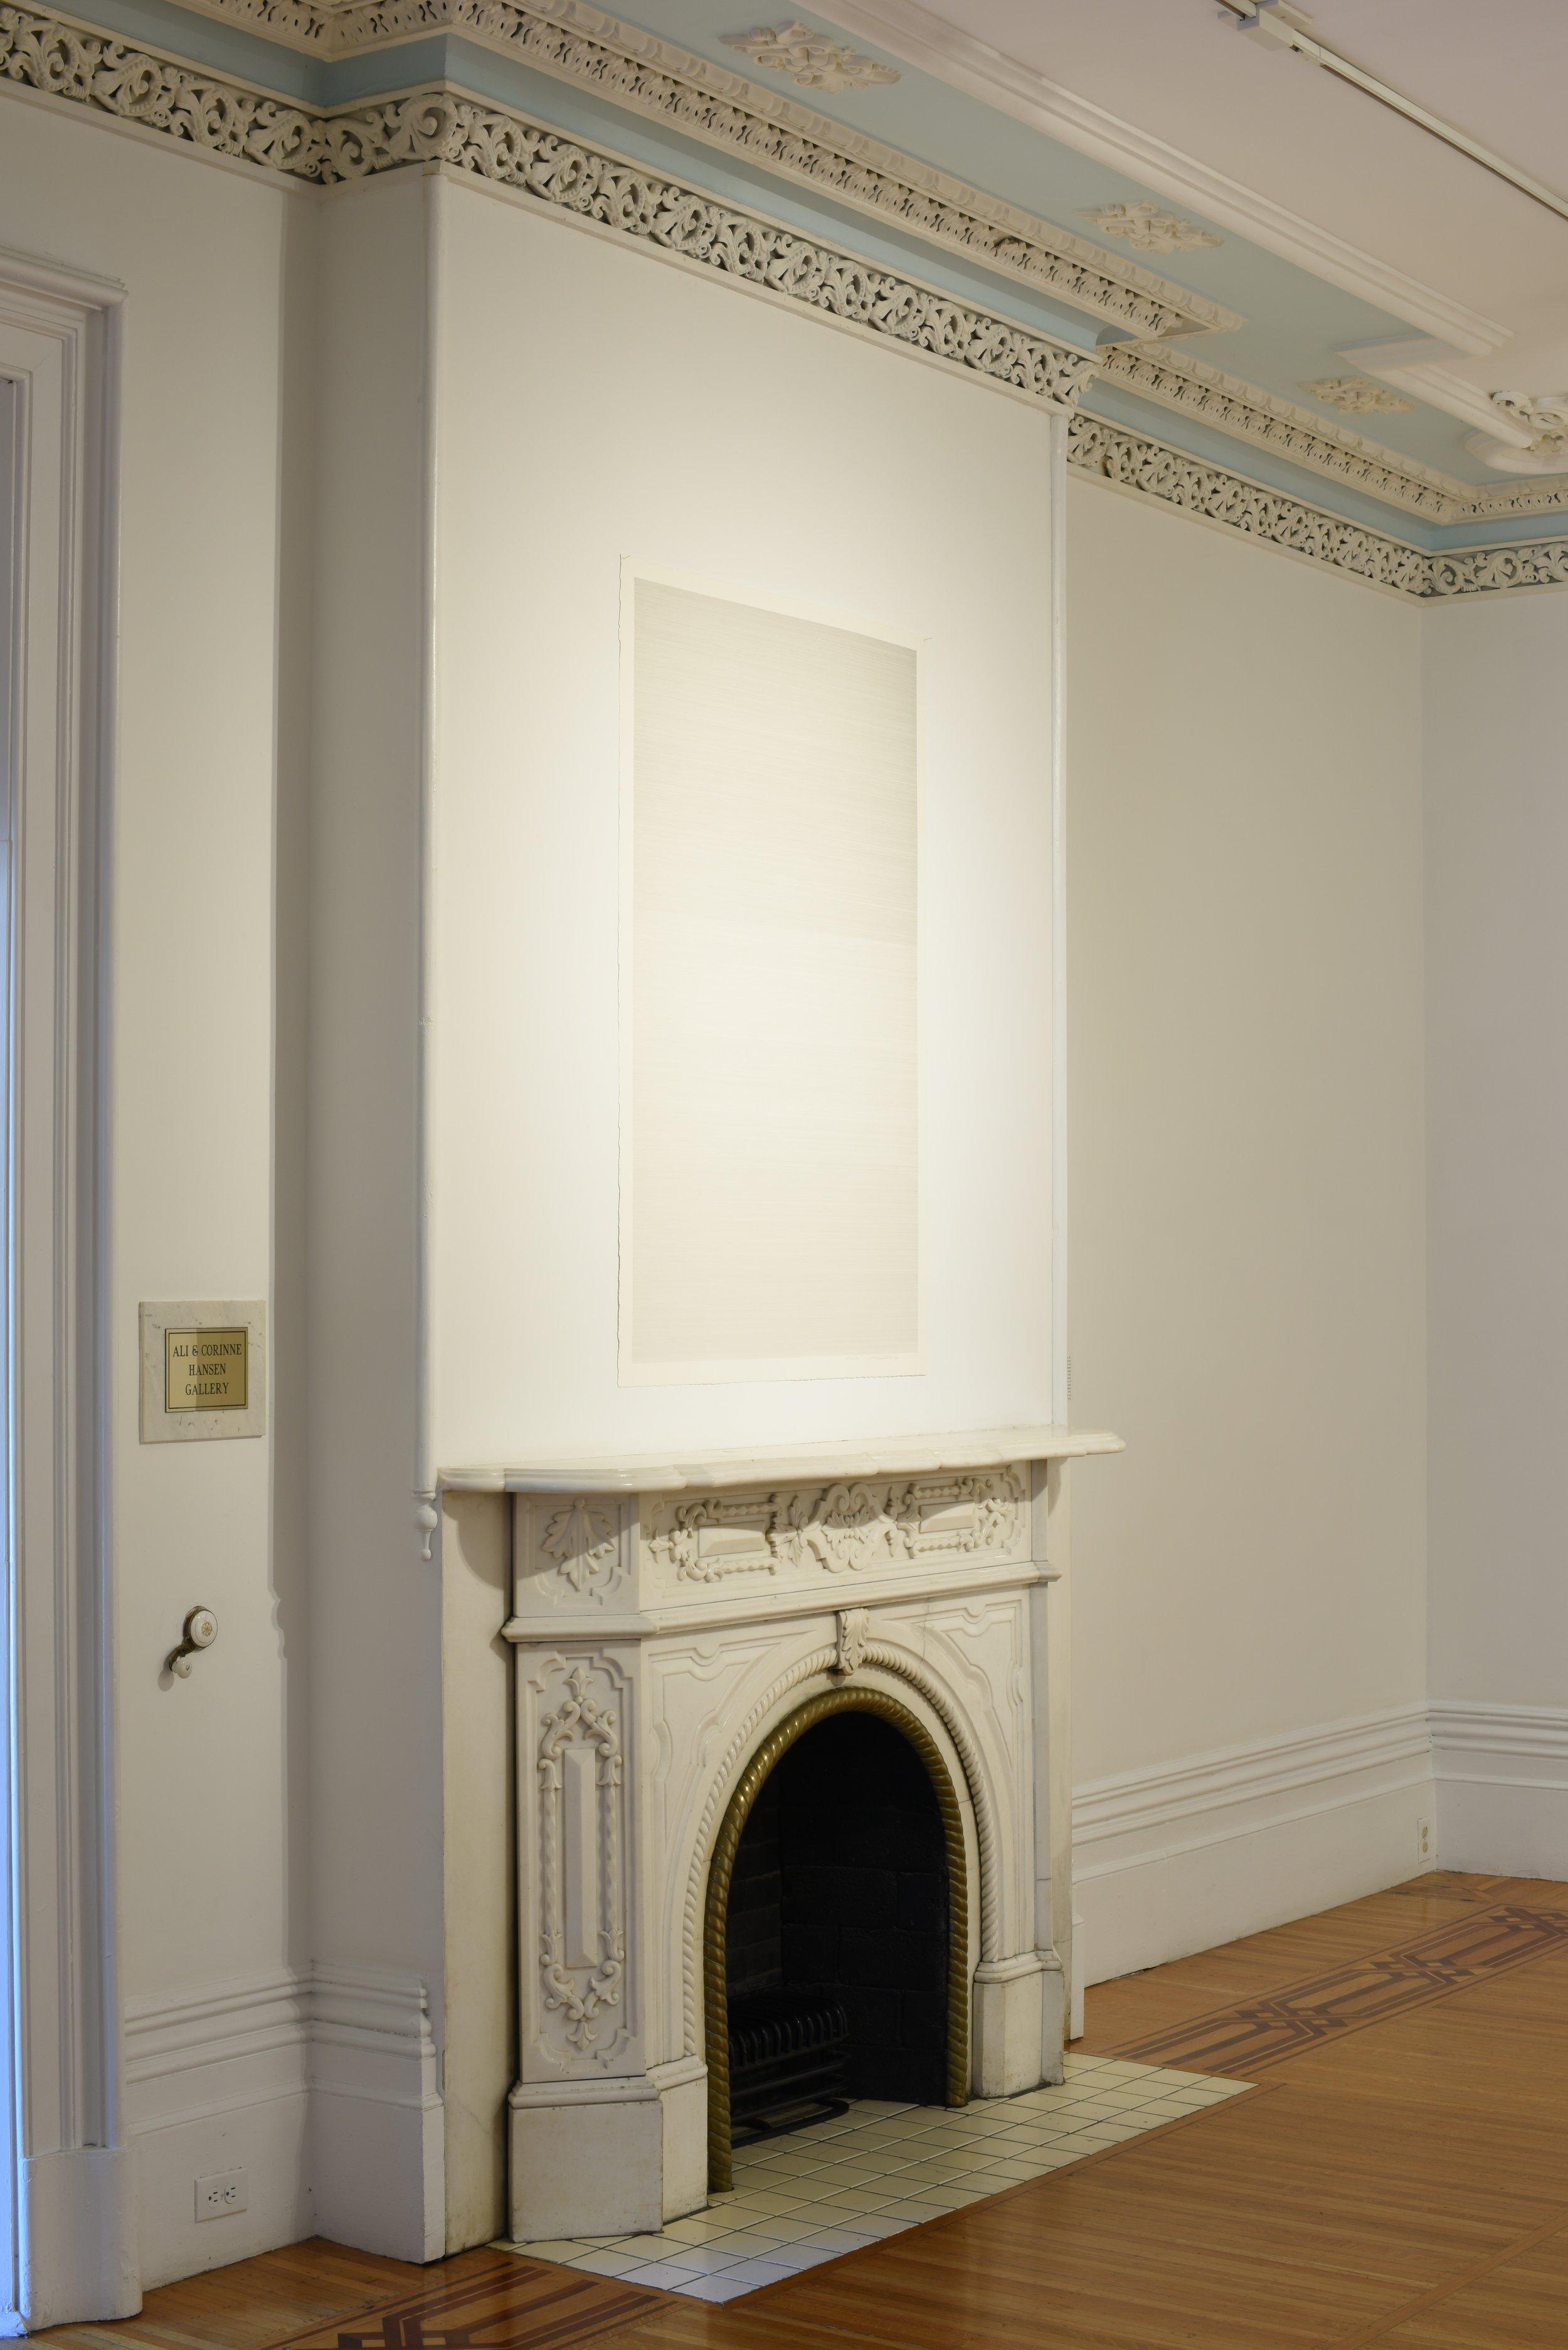 Rodman Hall Installation, 1389 Breaths, 2016